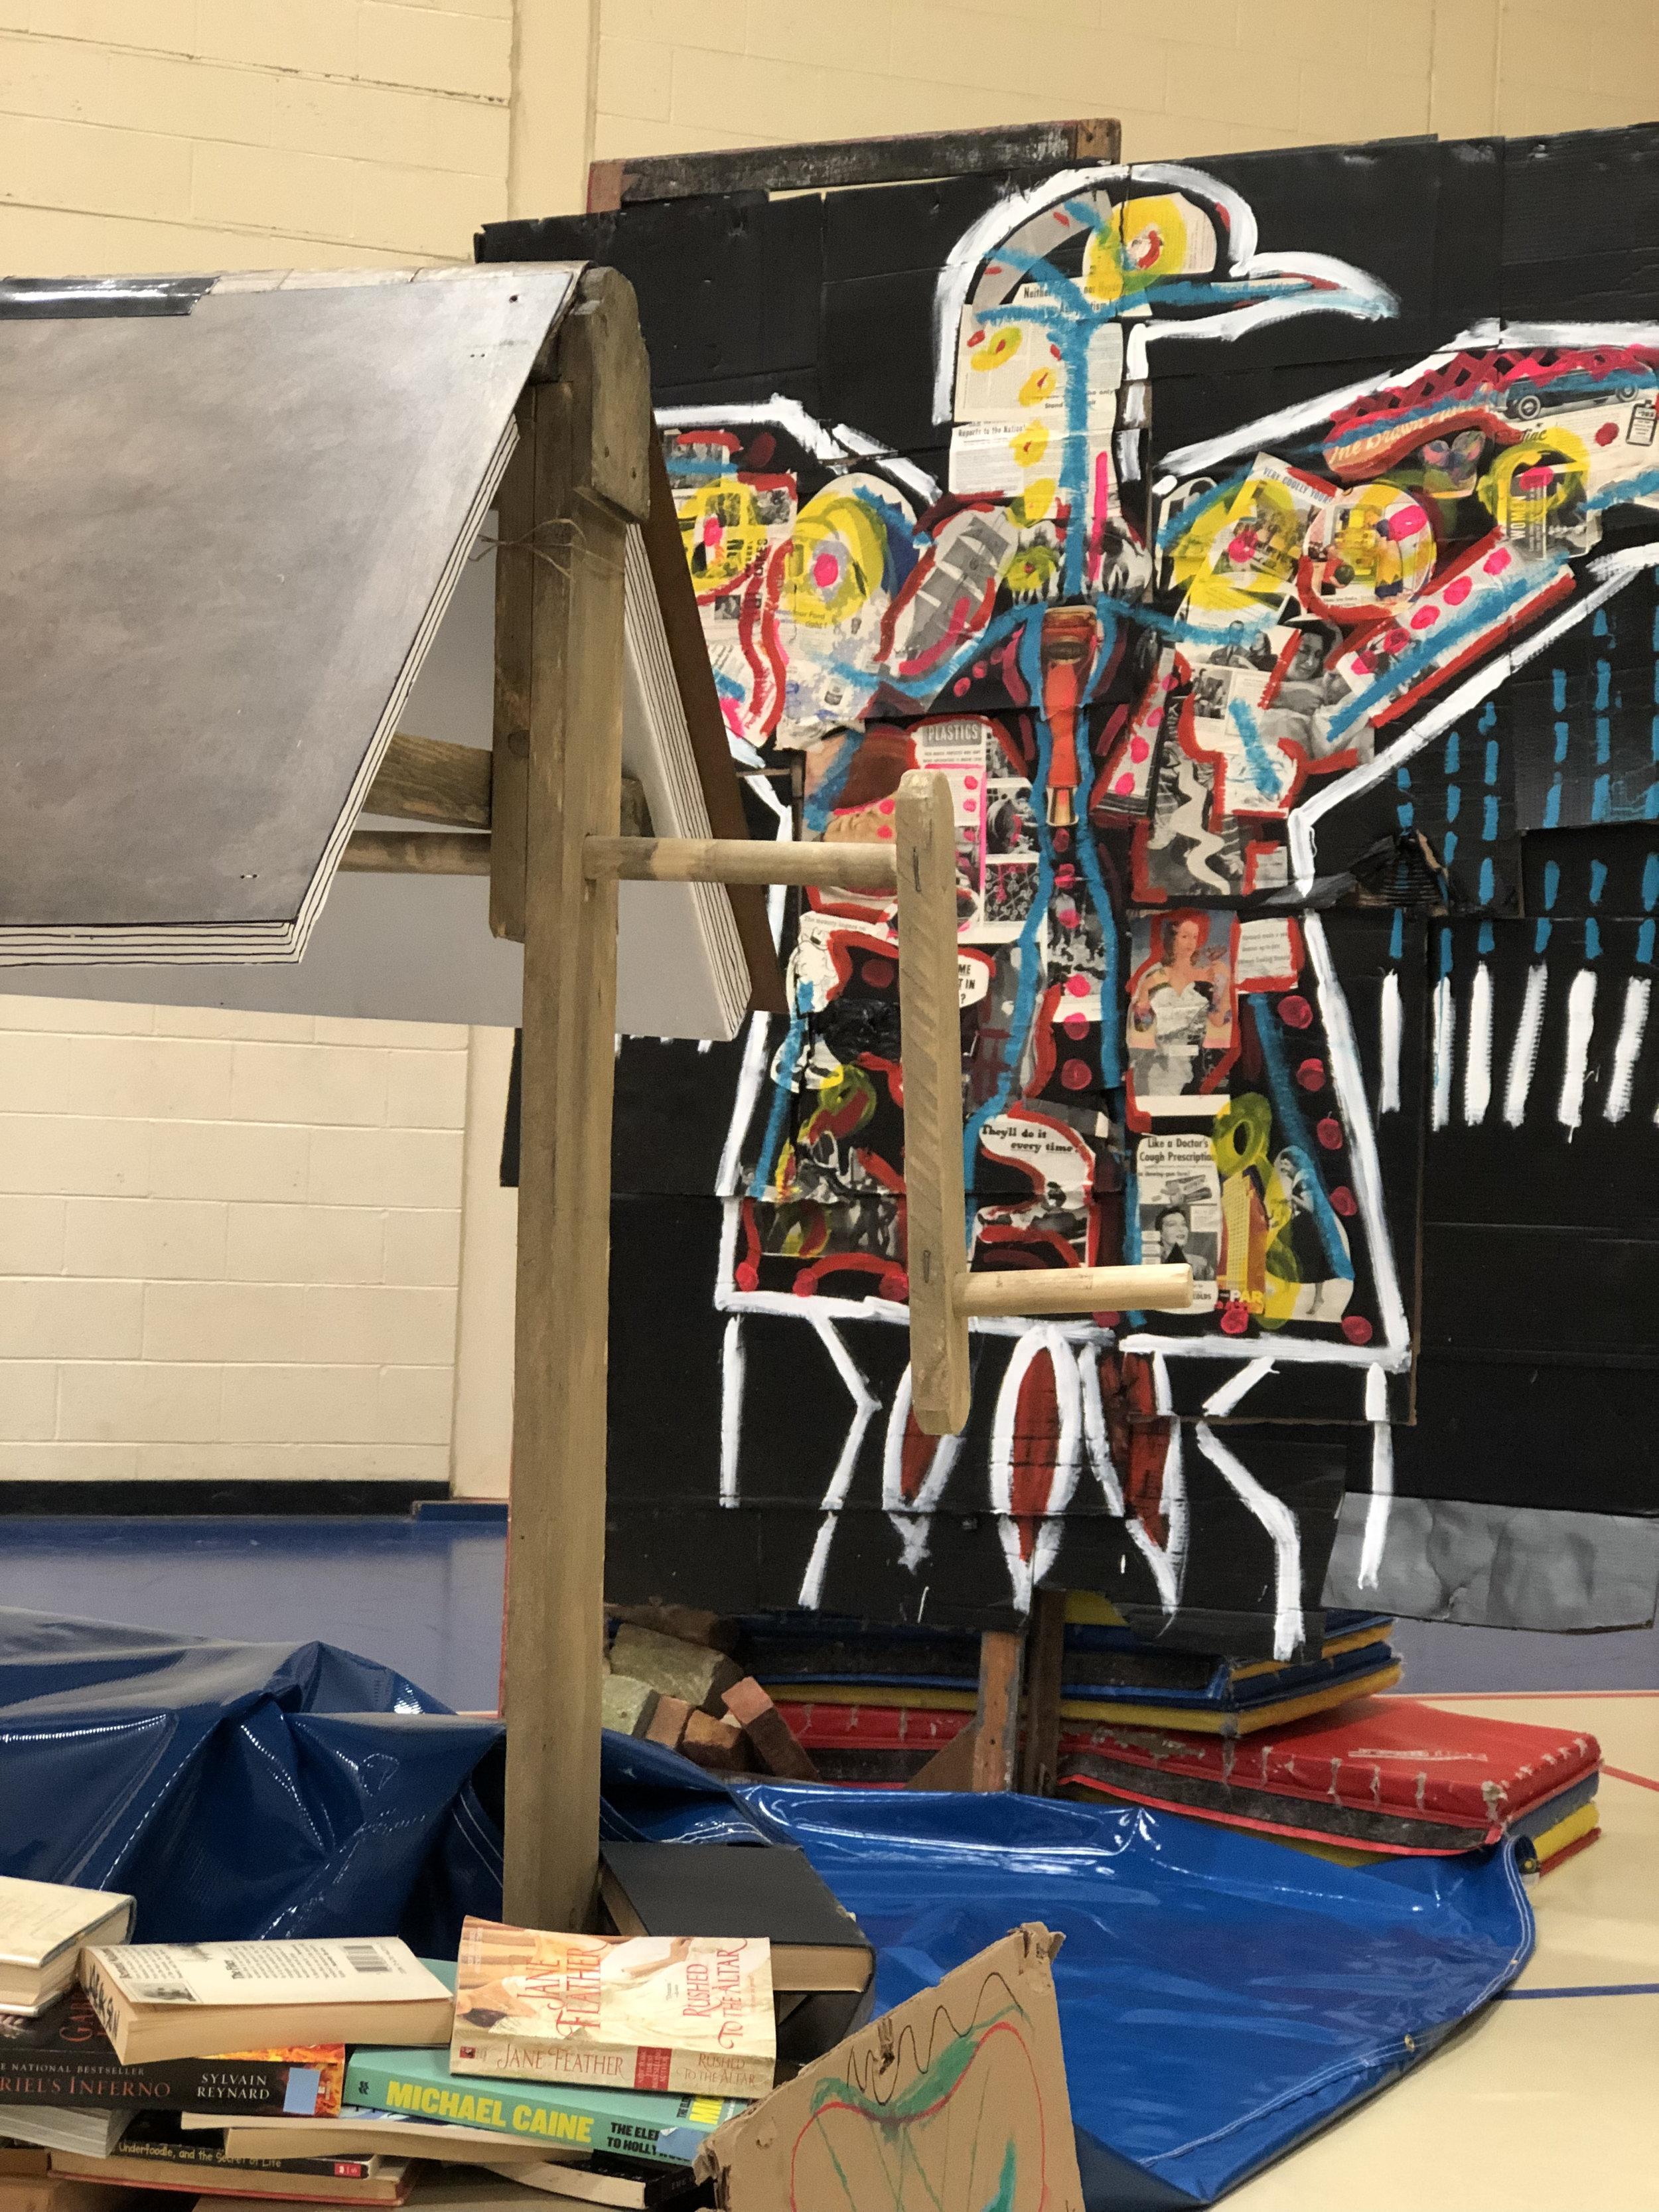 ElOsoAzul's Cardboard Arroyo of Mythical Creatures - Belchertown Art week Art Walk: April 28th 2019